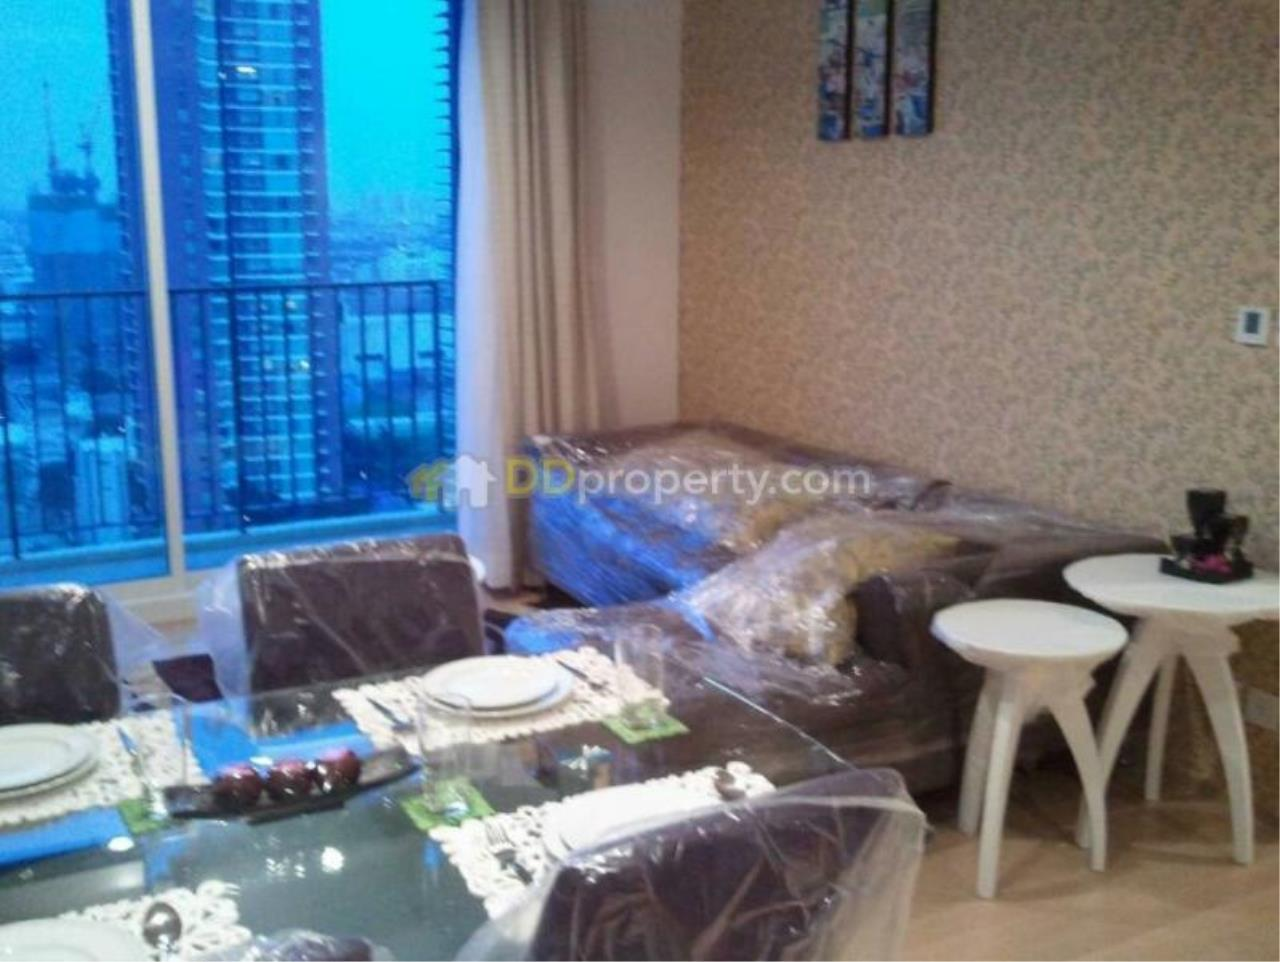 Quality Life Property Agency's  *****Rent****Sukhumvit Condominium BTS Thonglor 3